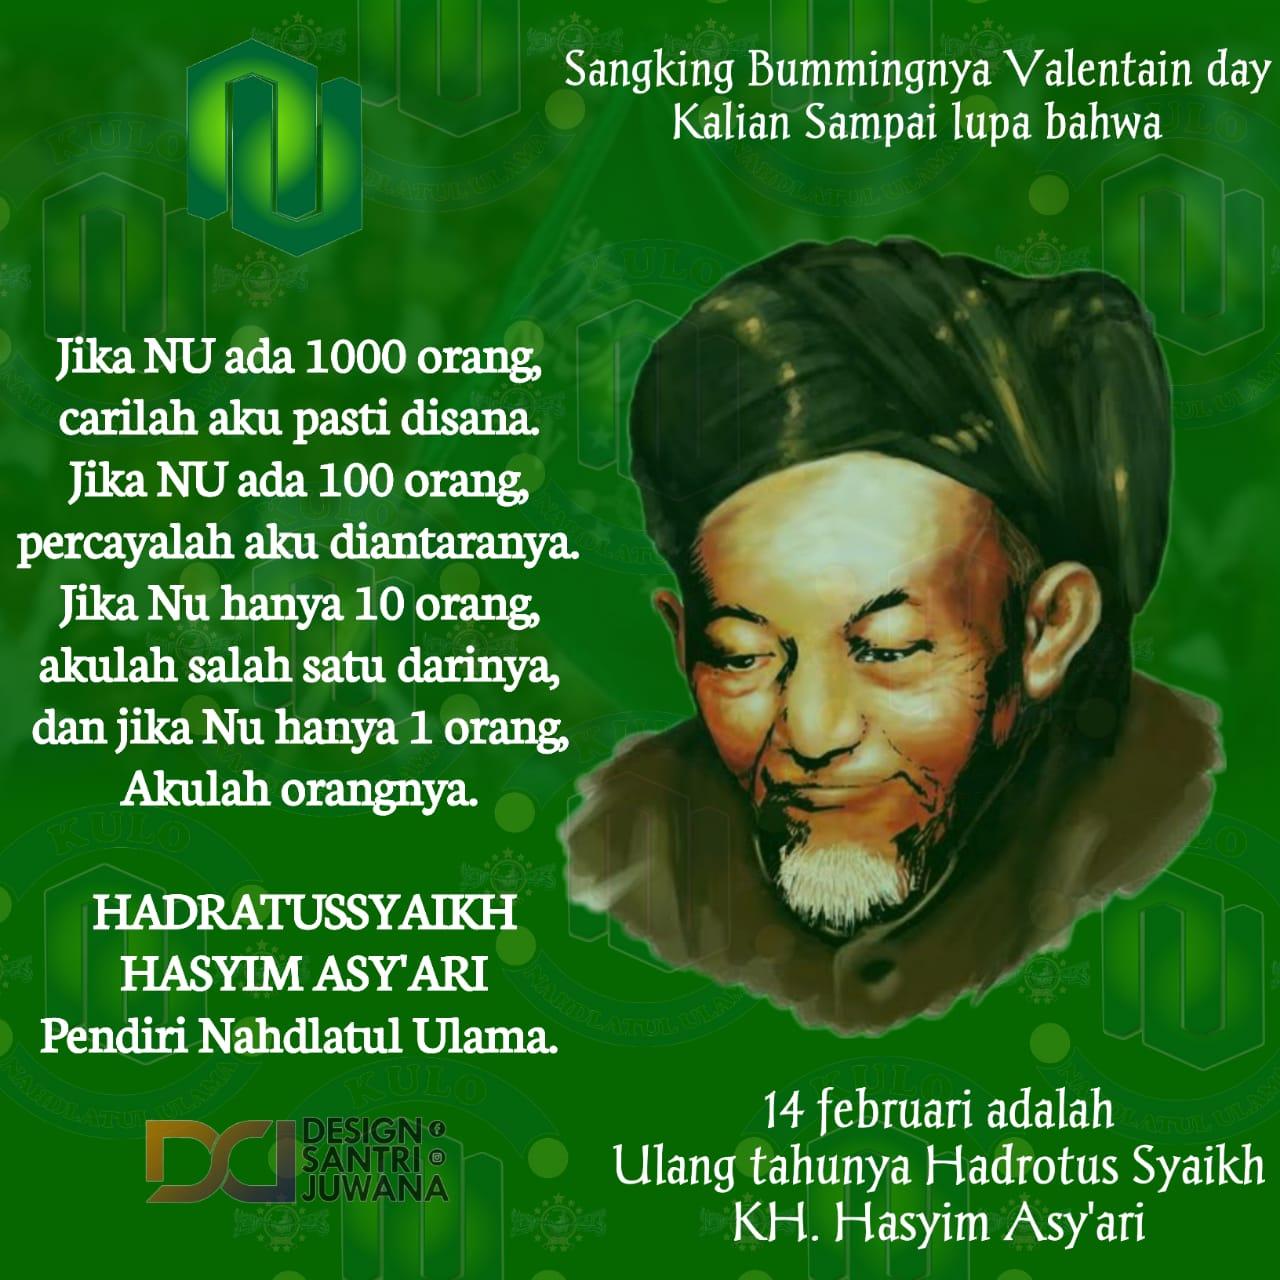 14 Februari adalah Tanggal Lahir Hadratussyaikh KH. Hasyim Asy'ari